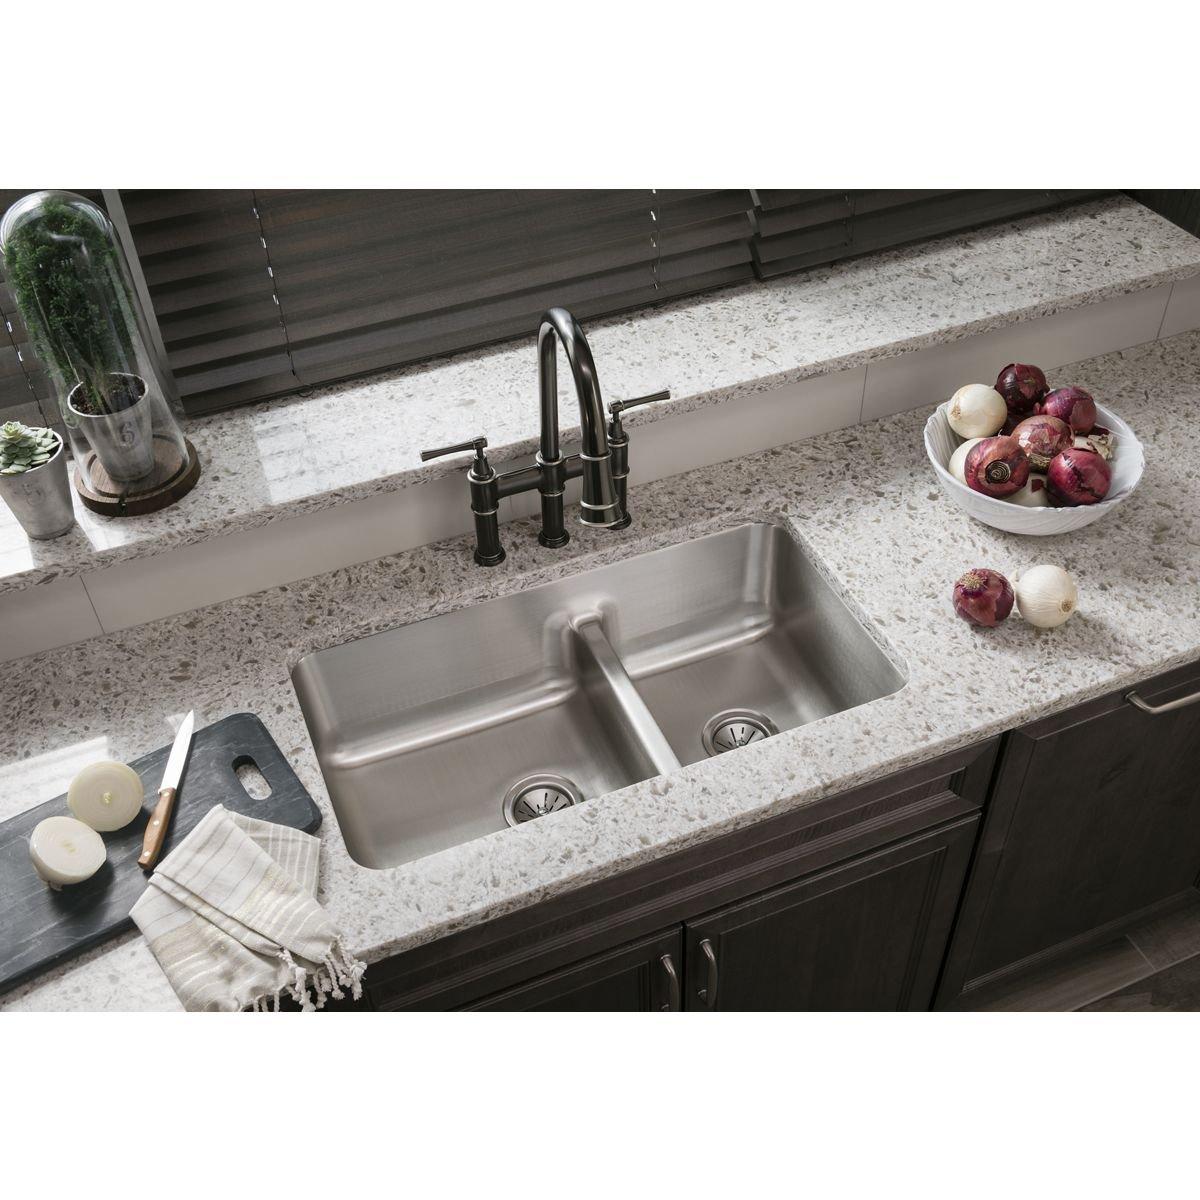 E Granite Kitchen Sinks Elkay Eluhaqd32179 Gourmet Undermount Sink Double Bowl Sinks